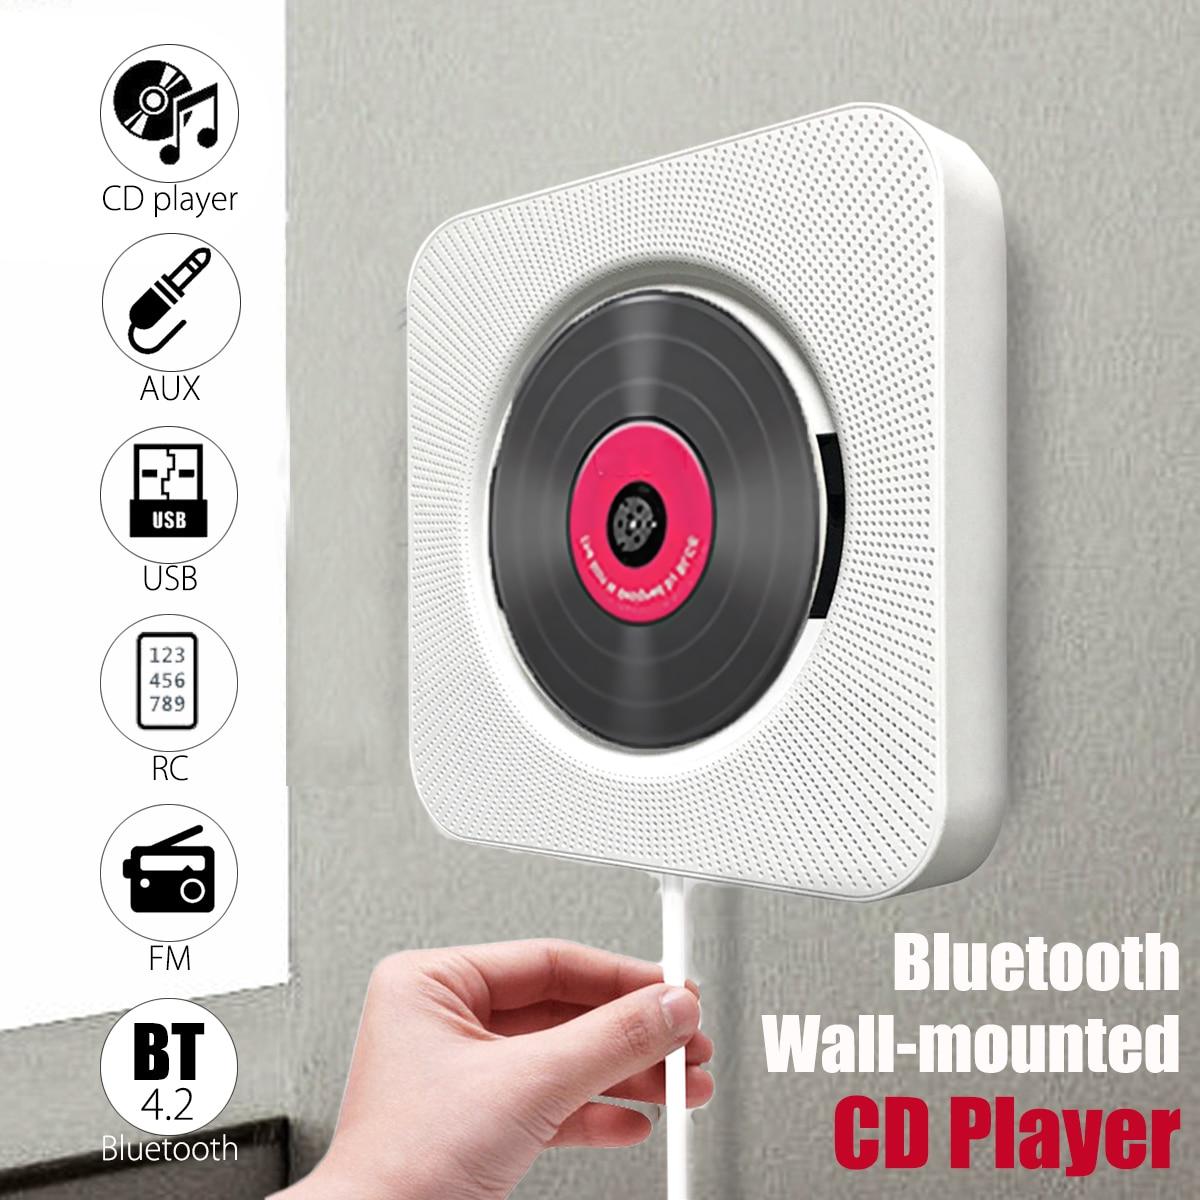 KINCO Portable Wall Mountable CD Player Bluetooth Speaker Music Player Remote Control HiFi FM Radio USB MP3 Stereo godovic wall cd player cd machine sound mp3 music player wall mount cd player portable with bluetooth remote control